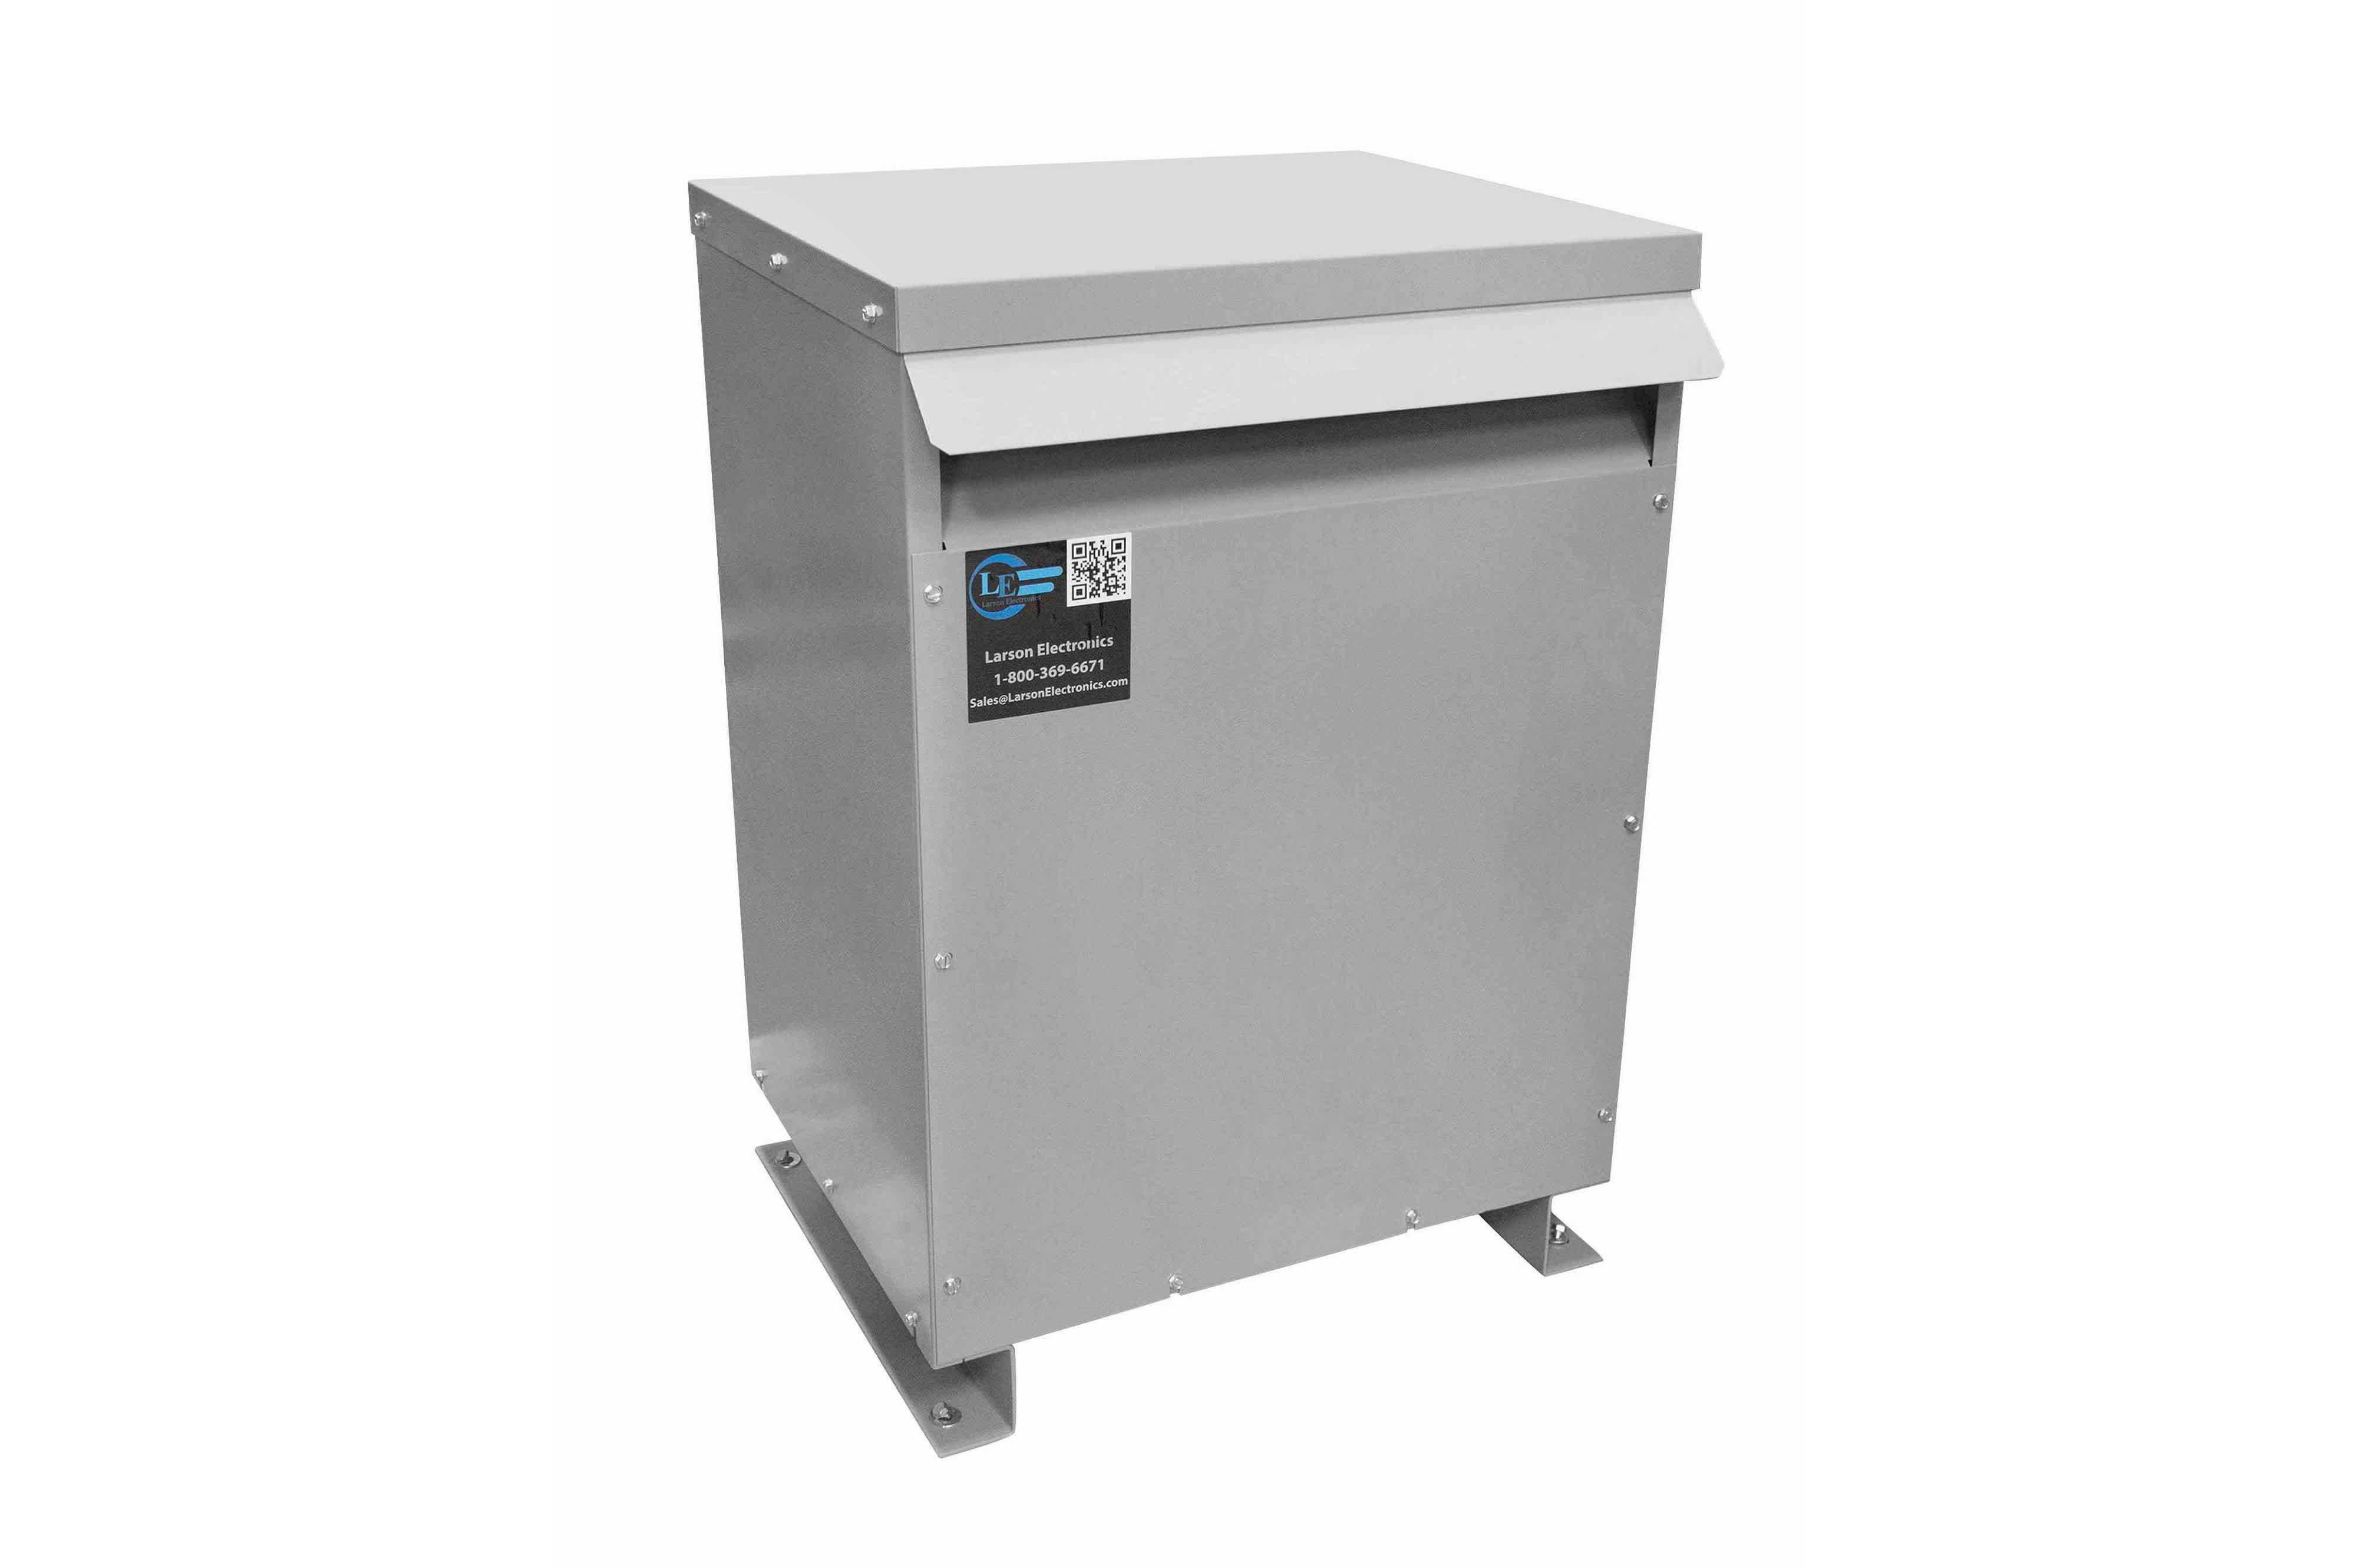 50 kVA 3PH DOE Transformer, 415V Delta Primary, 600Y/347 Wye-N Secondary, N3R, Ventilated, 60 Hz